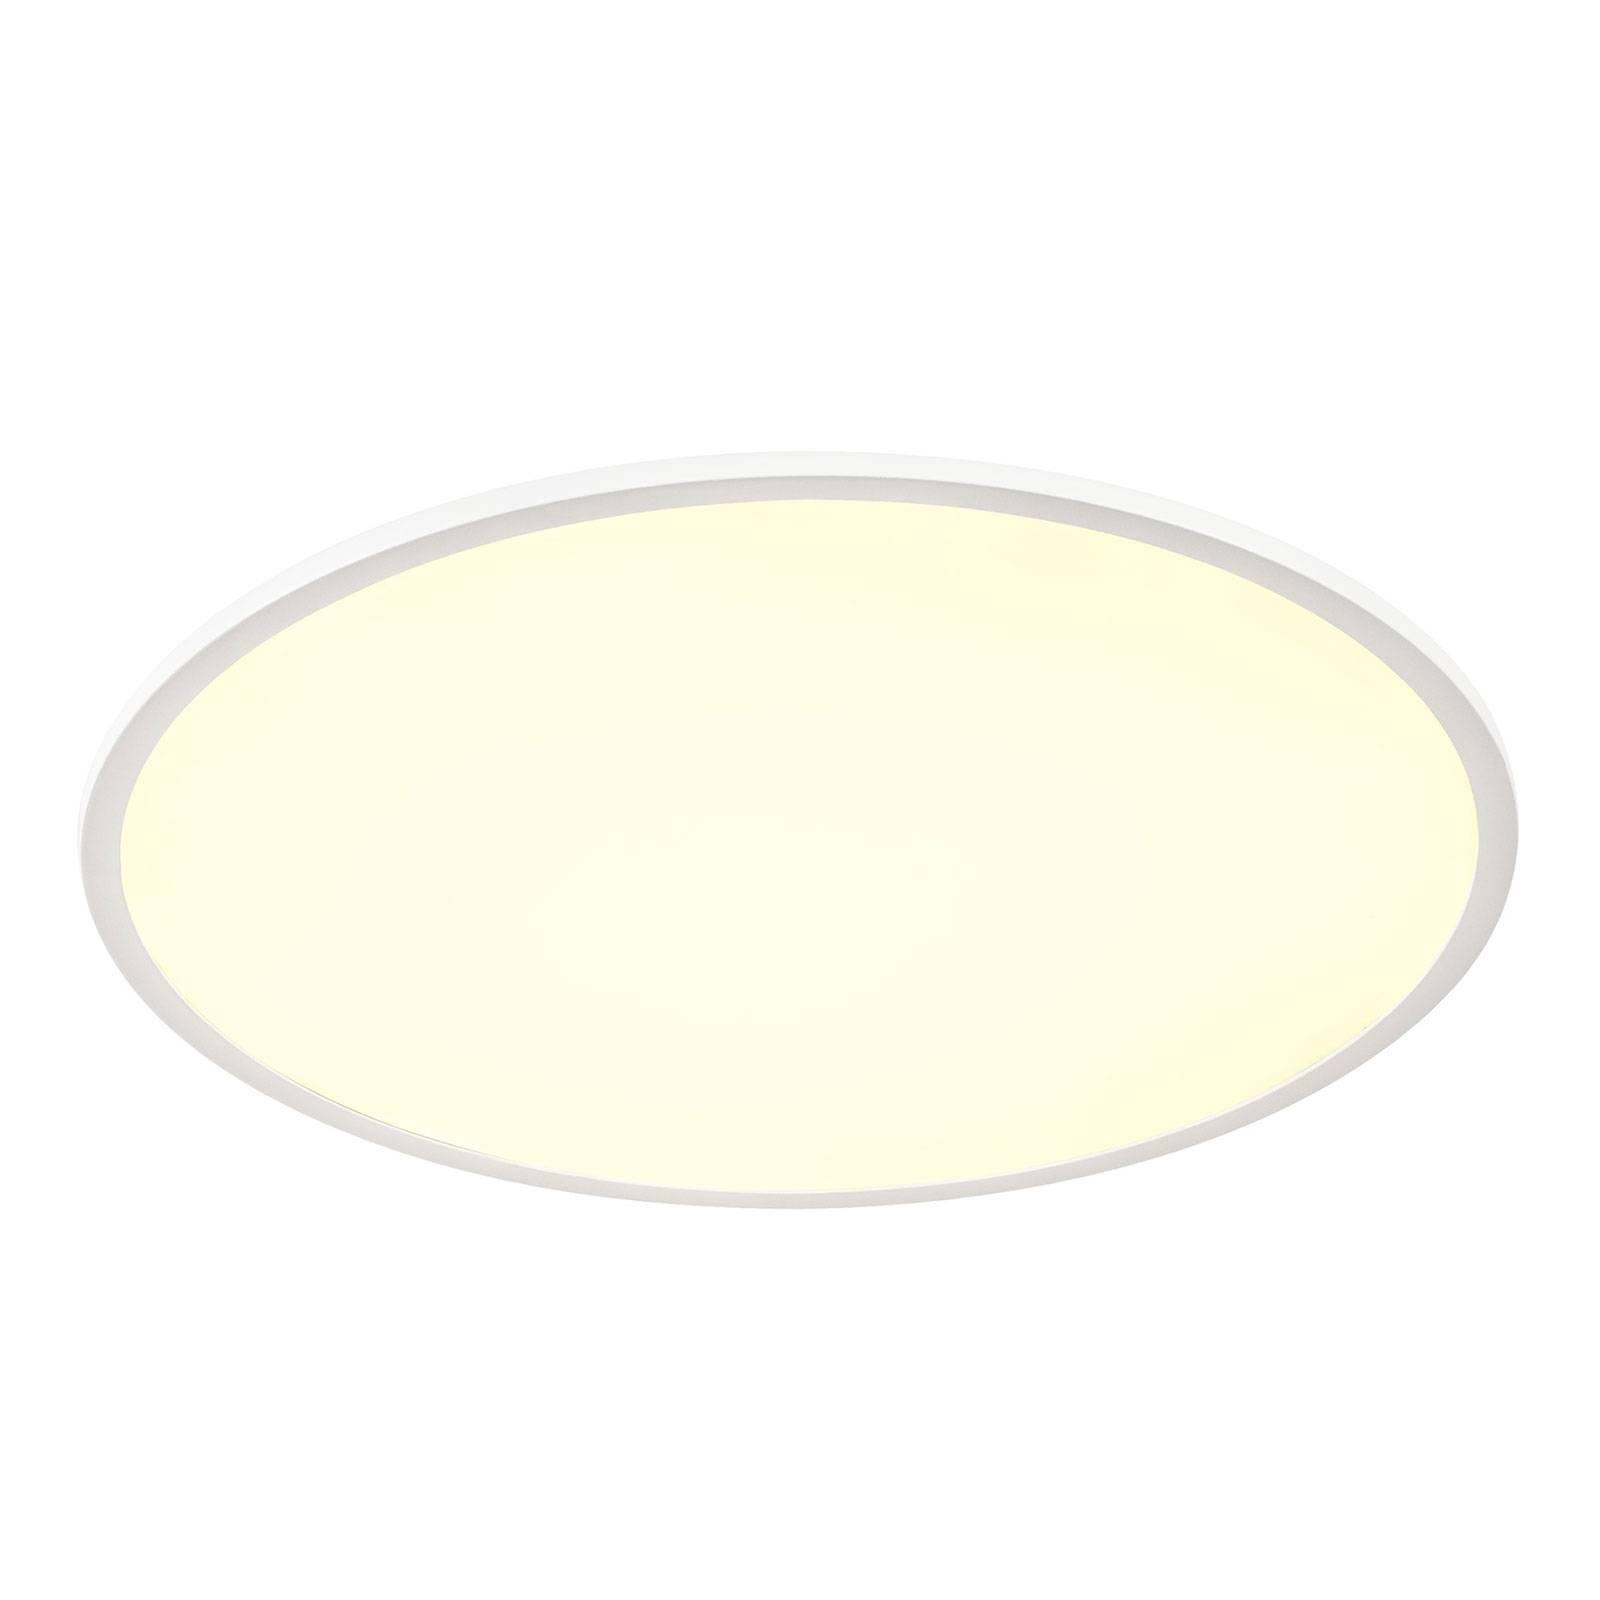 SLV Panel 60 -LED-kattovalaisin 4 000 K, valkoinen